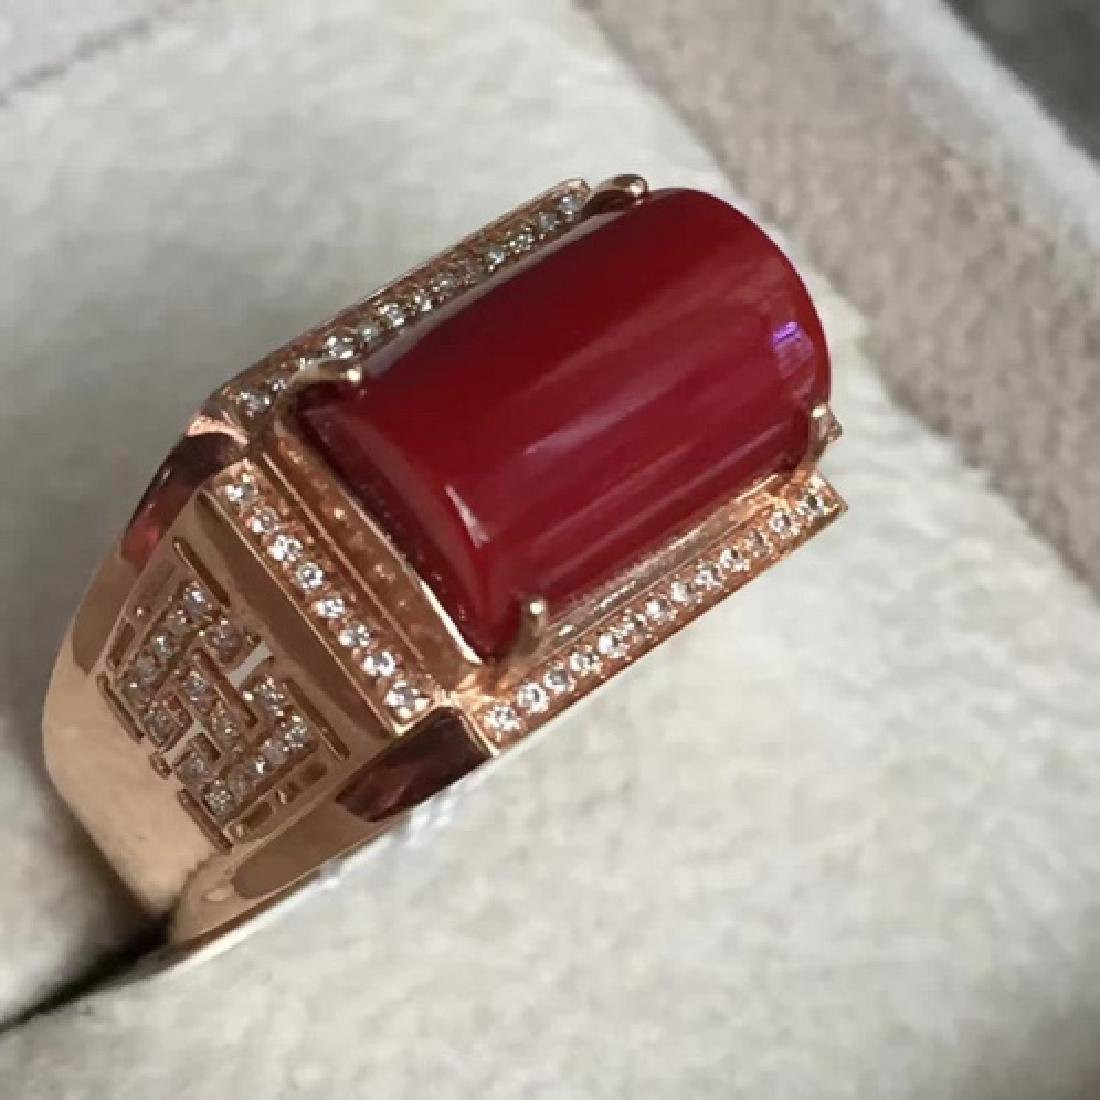 18K AKA MALE RING WITH DIAMOND - 4